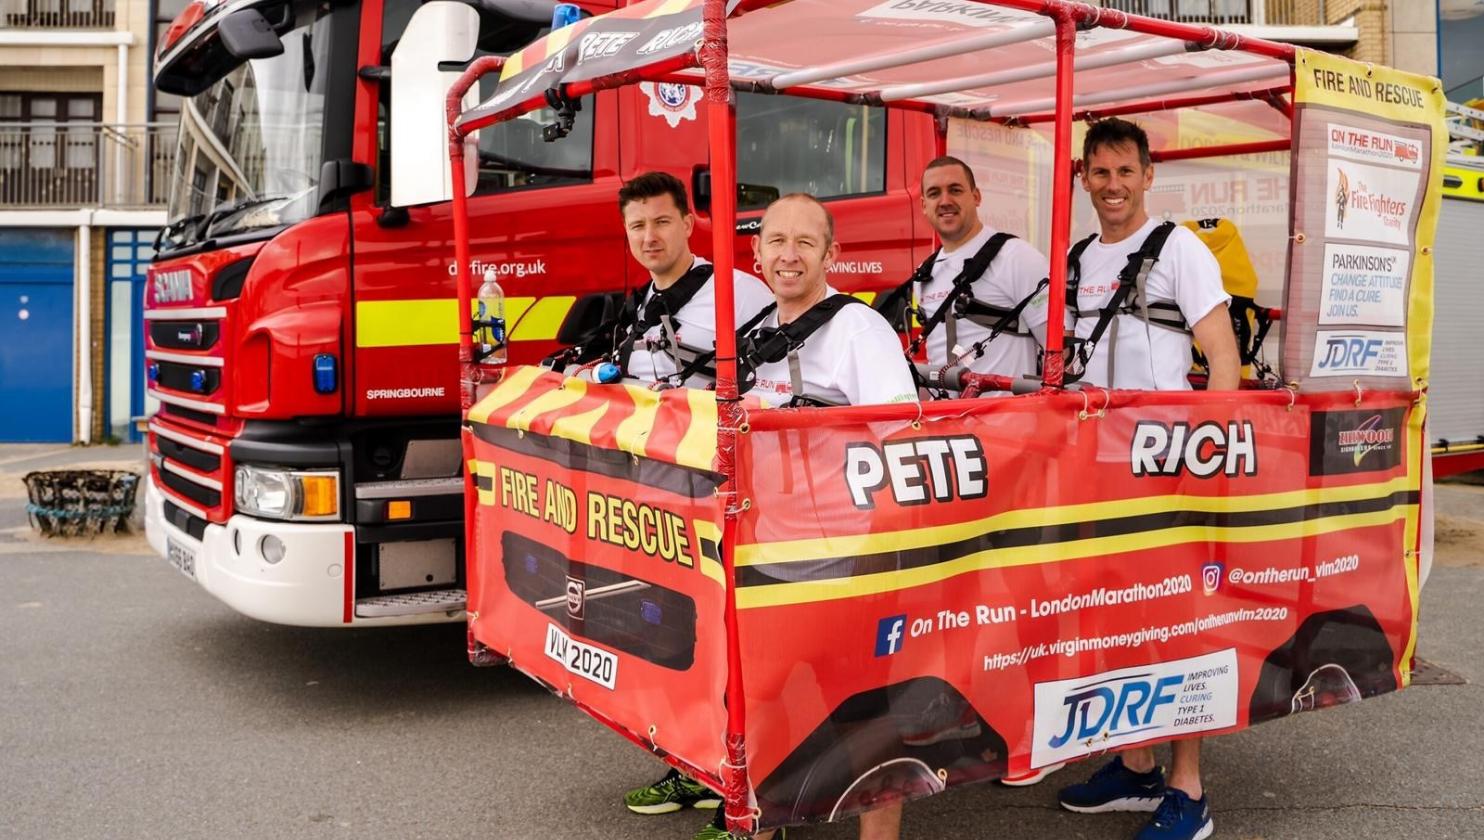 Firefighters running London Marathon in mini fire engine